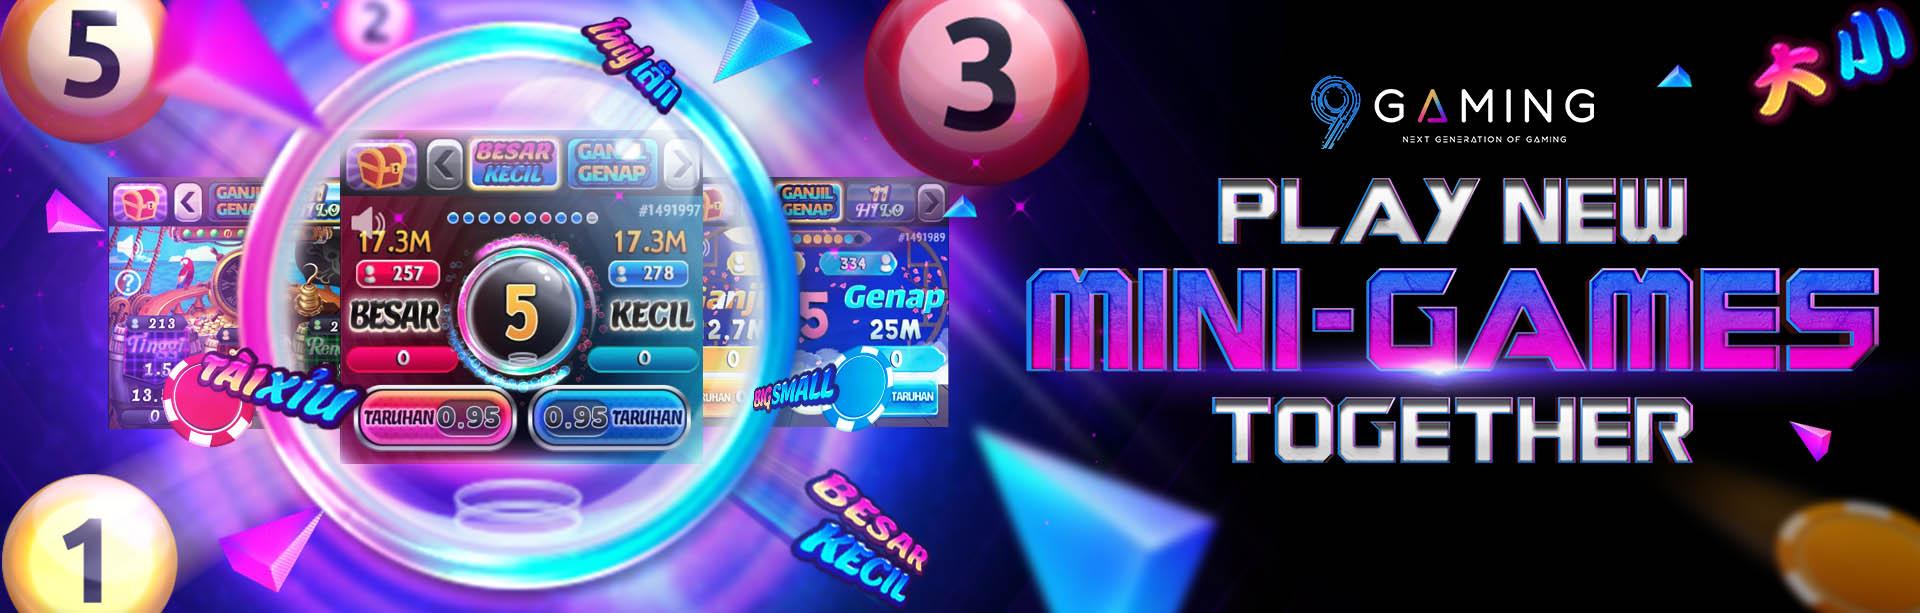 Agen Poker 9 Gaming